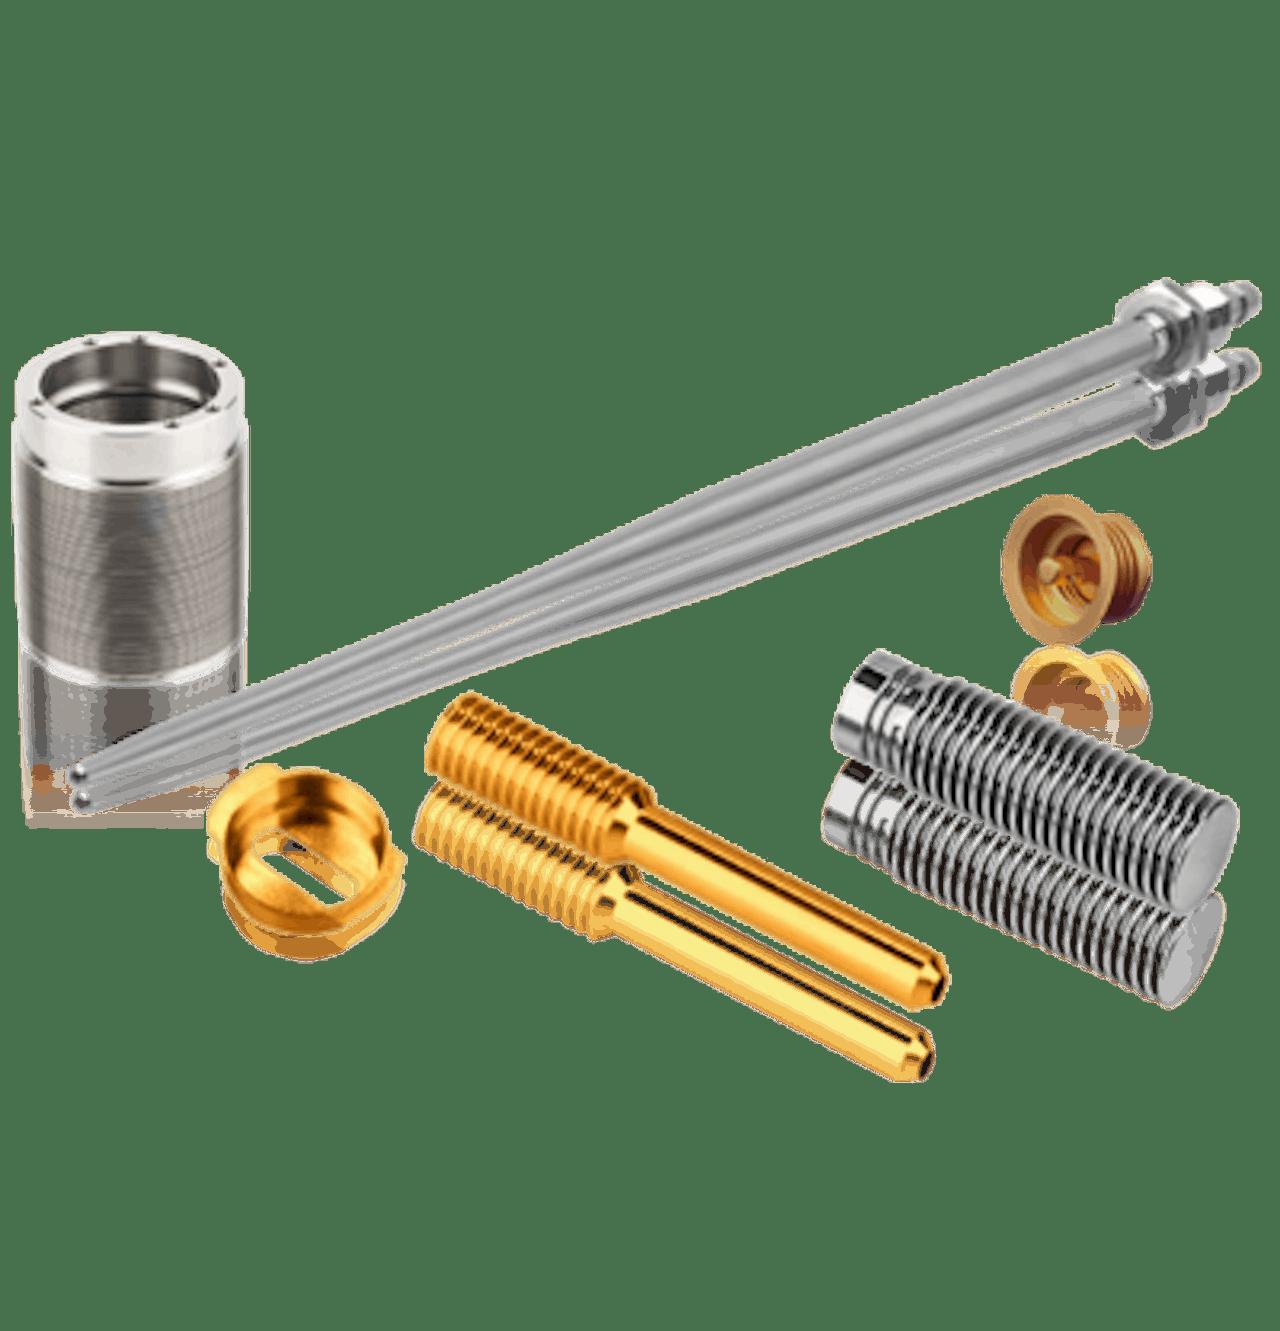 Edge welded medical bellows